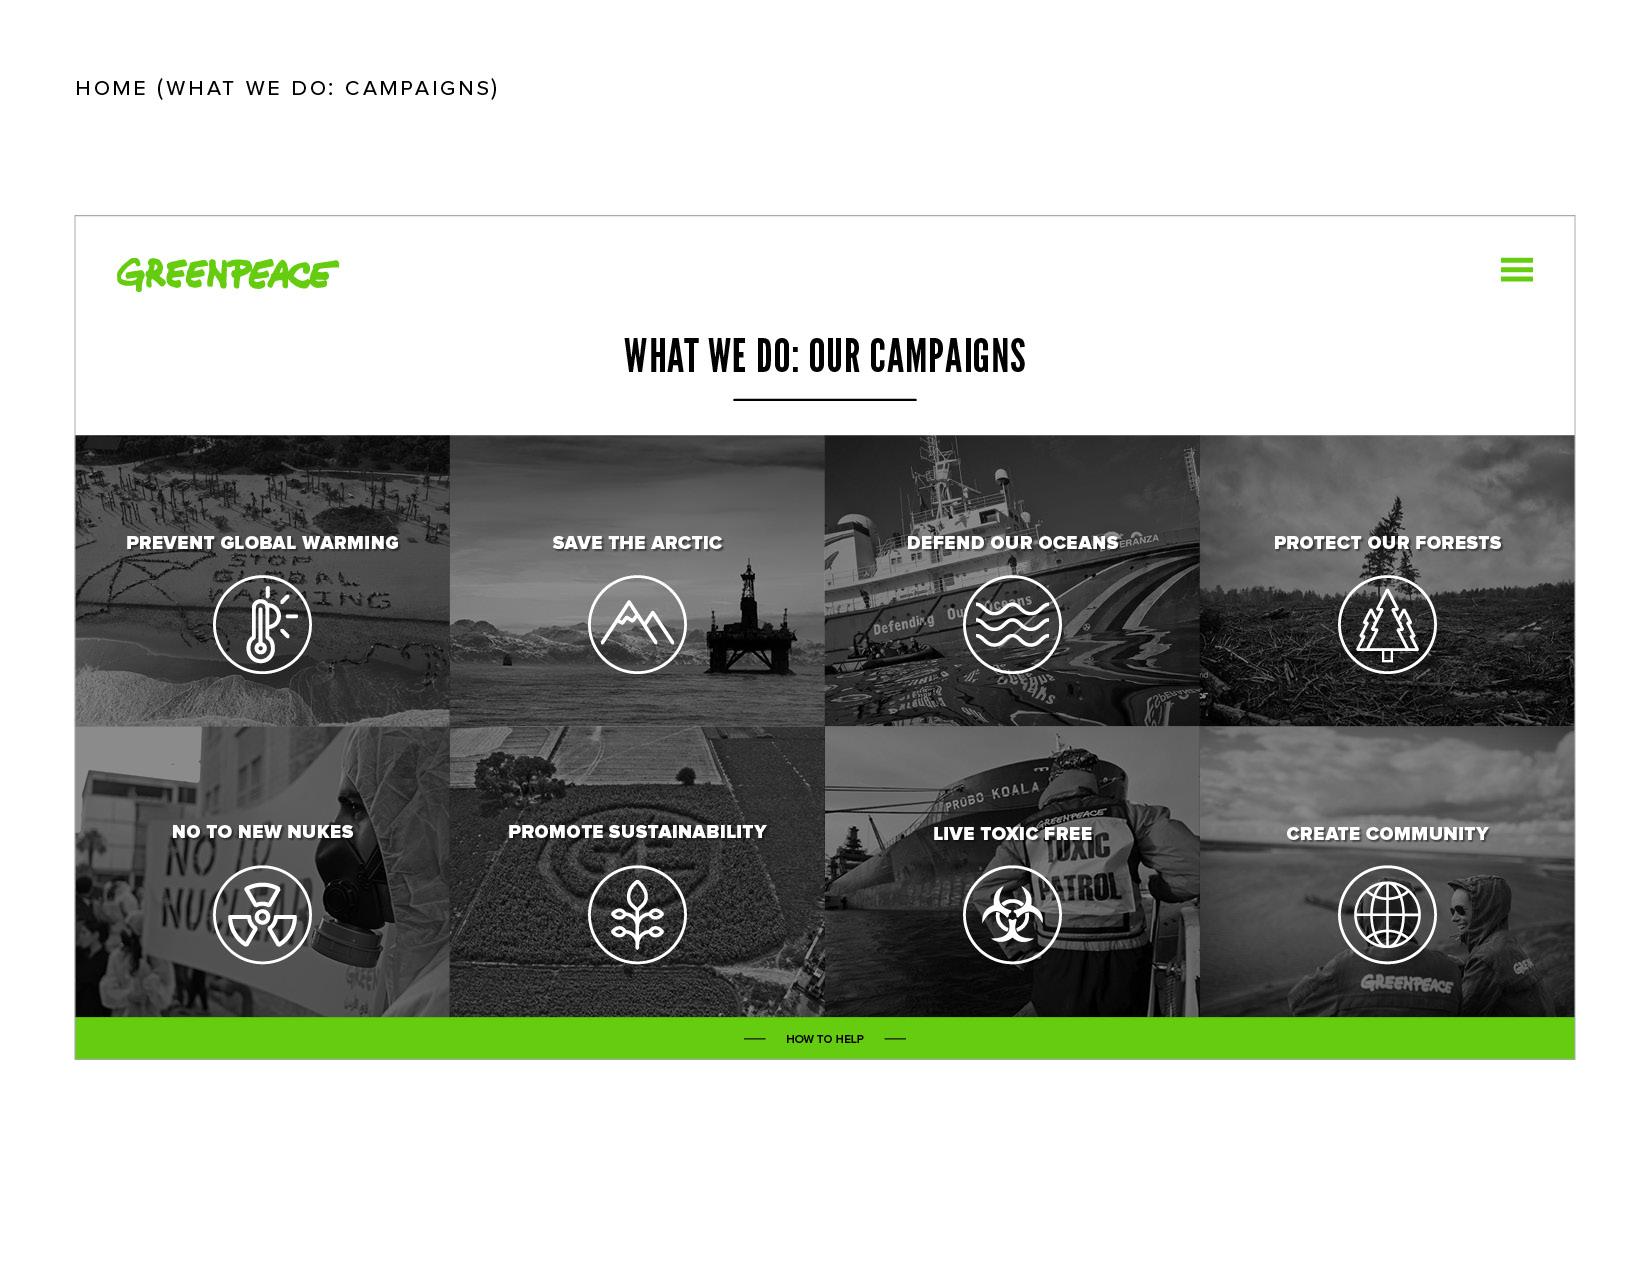 greenpeace9.jpg